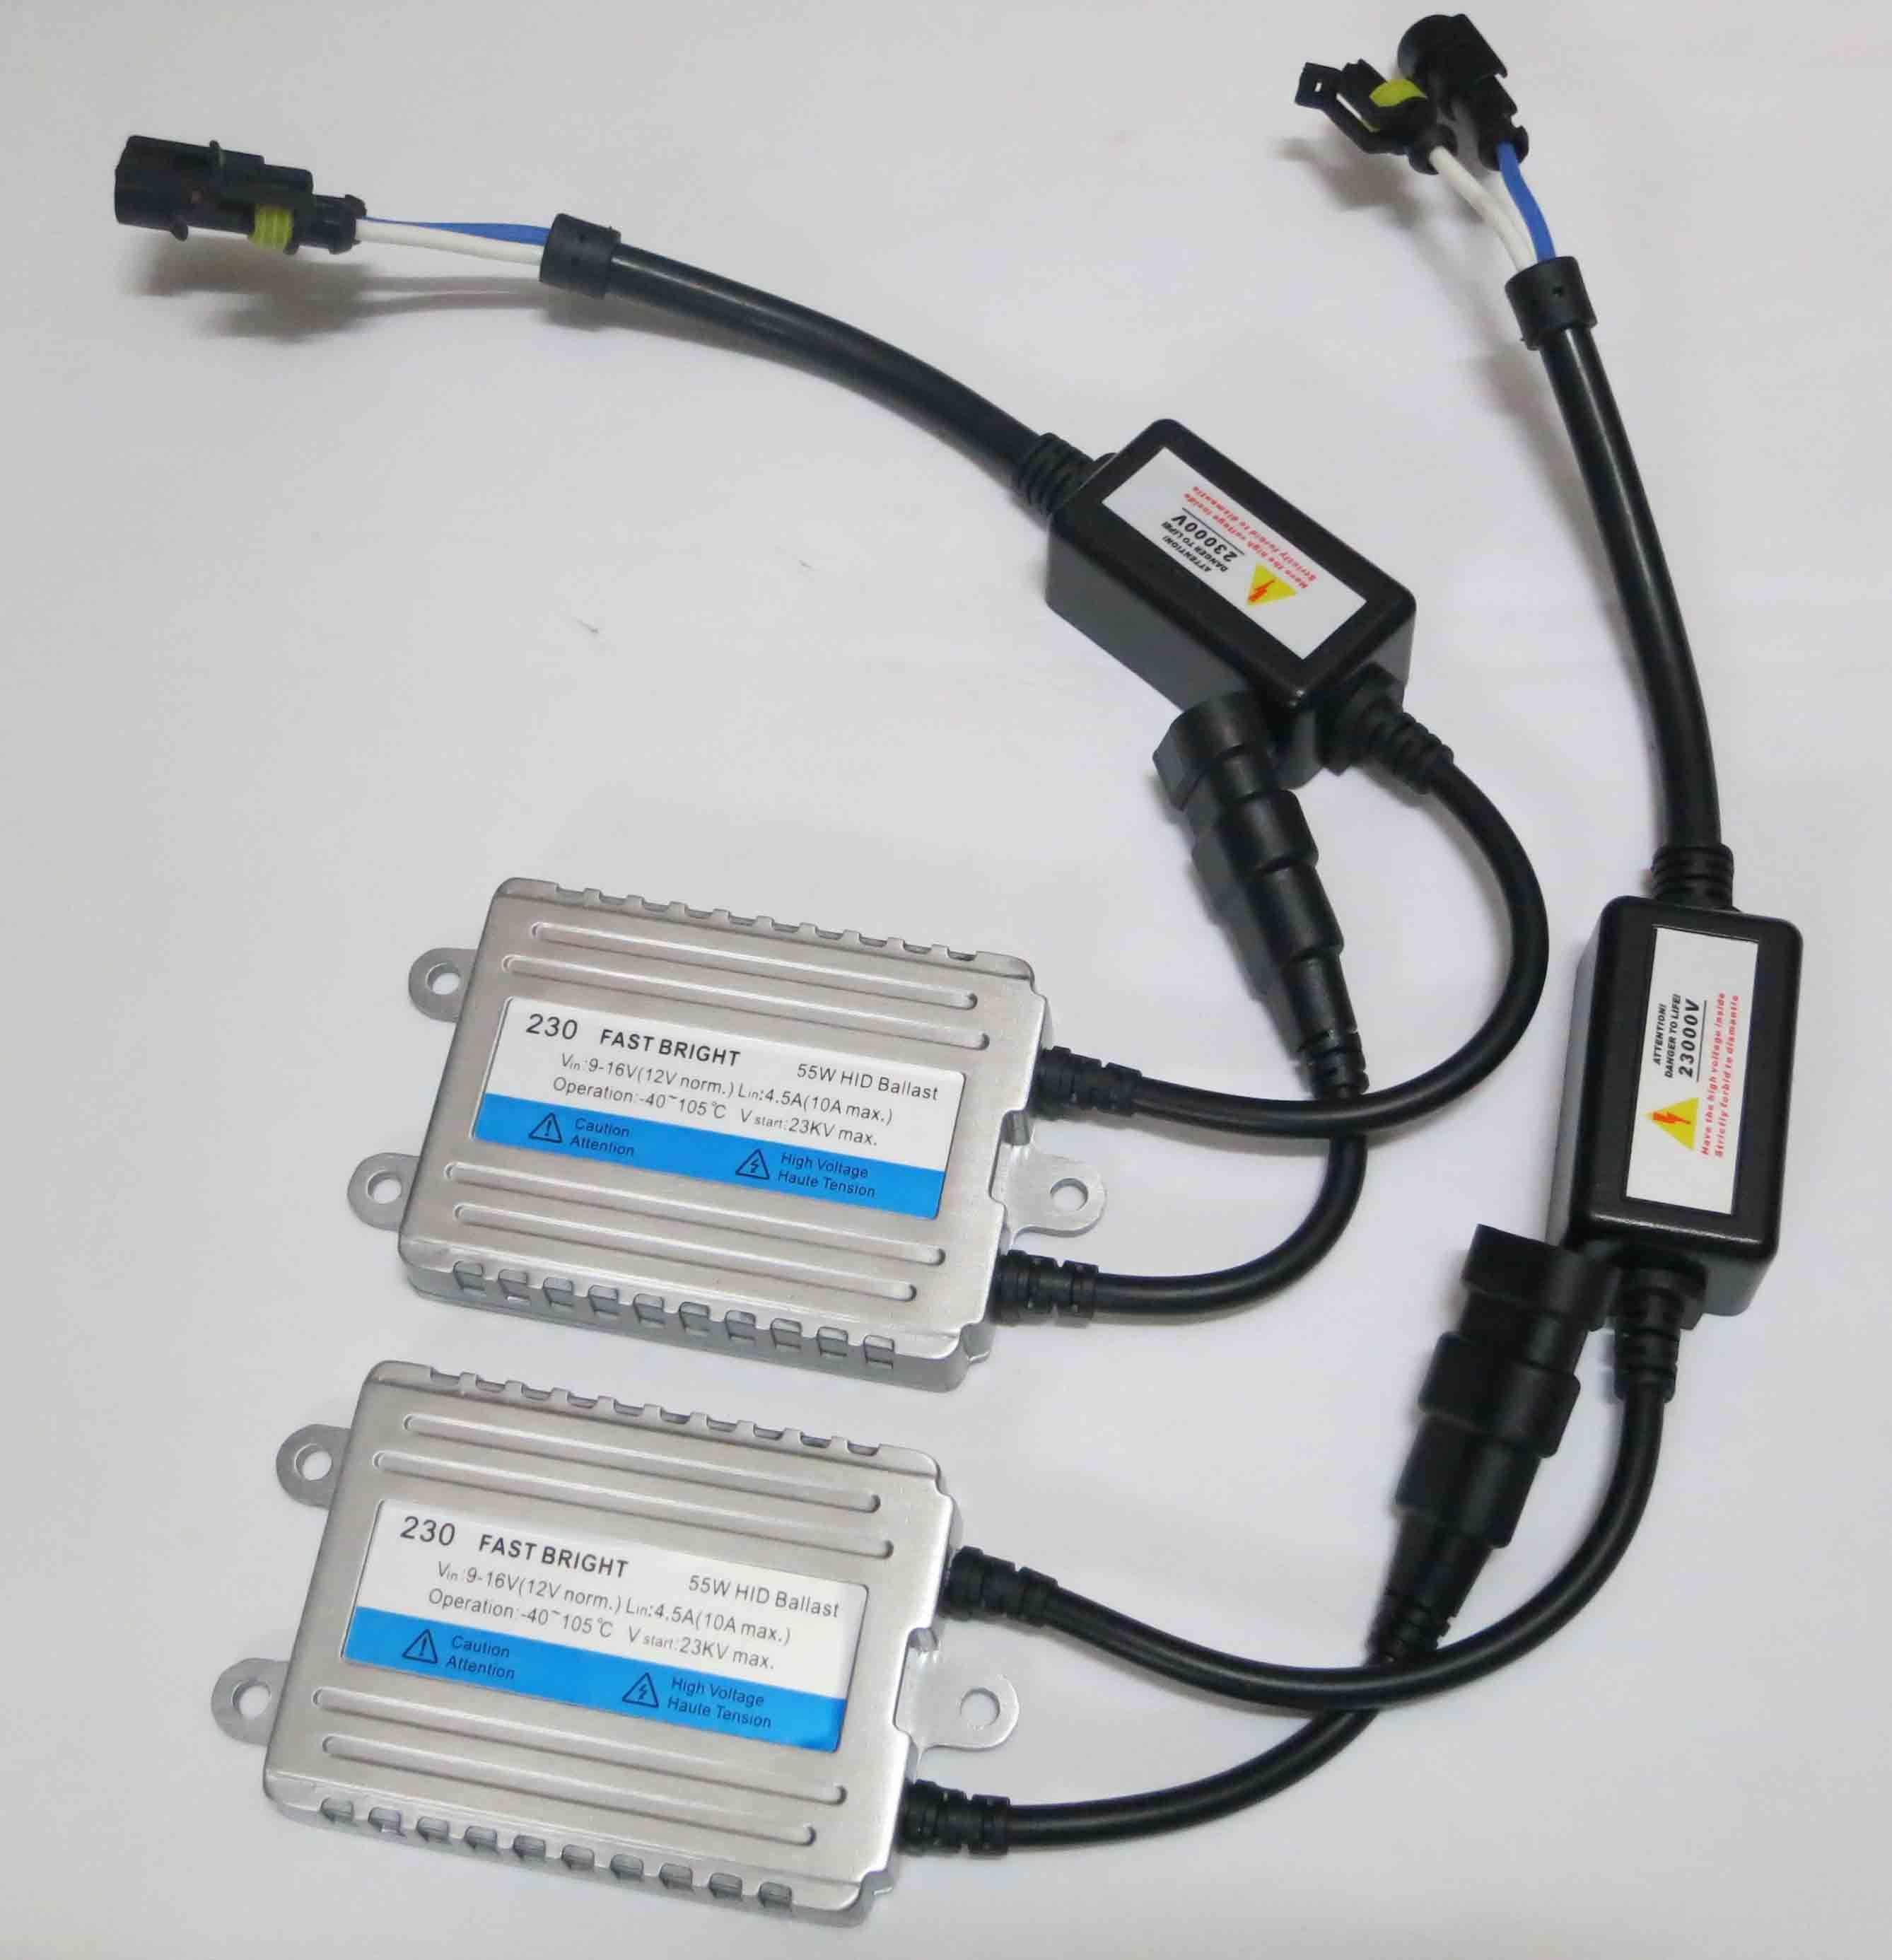 55W Ballasts Slim Bright Rapide Remplacement Xénon HID 2012 0,1 Second Ballasts de démarrage rapide 12V